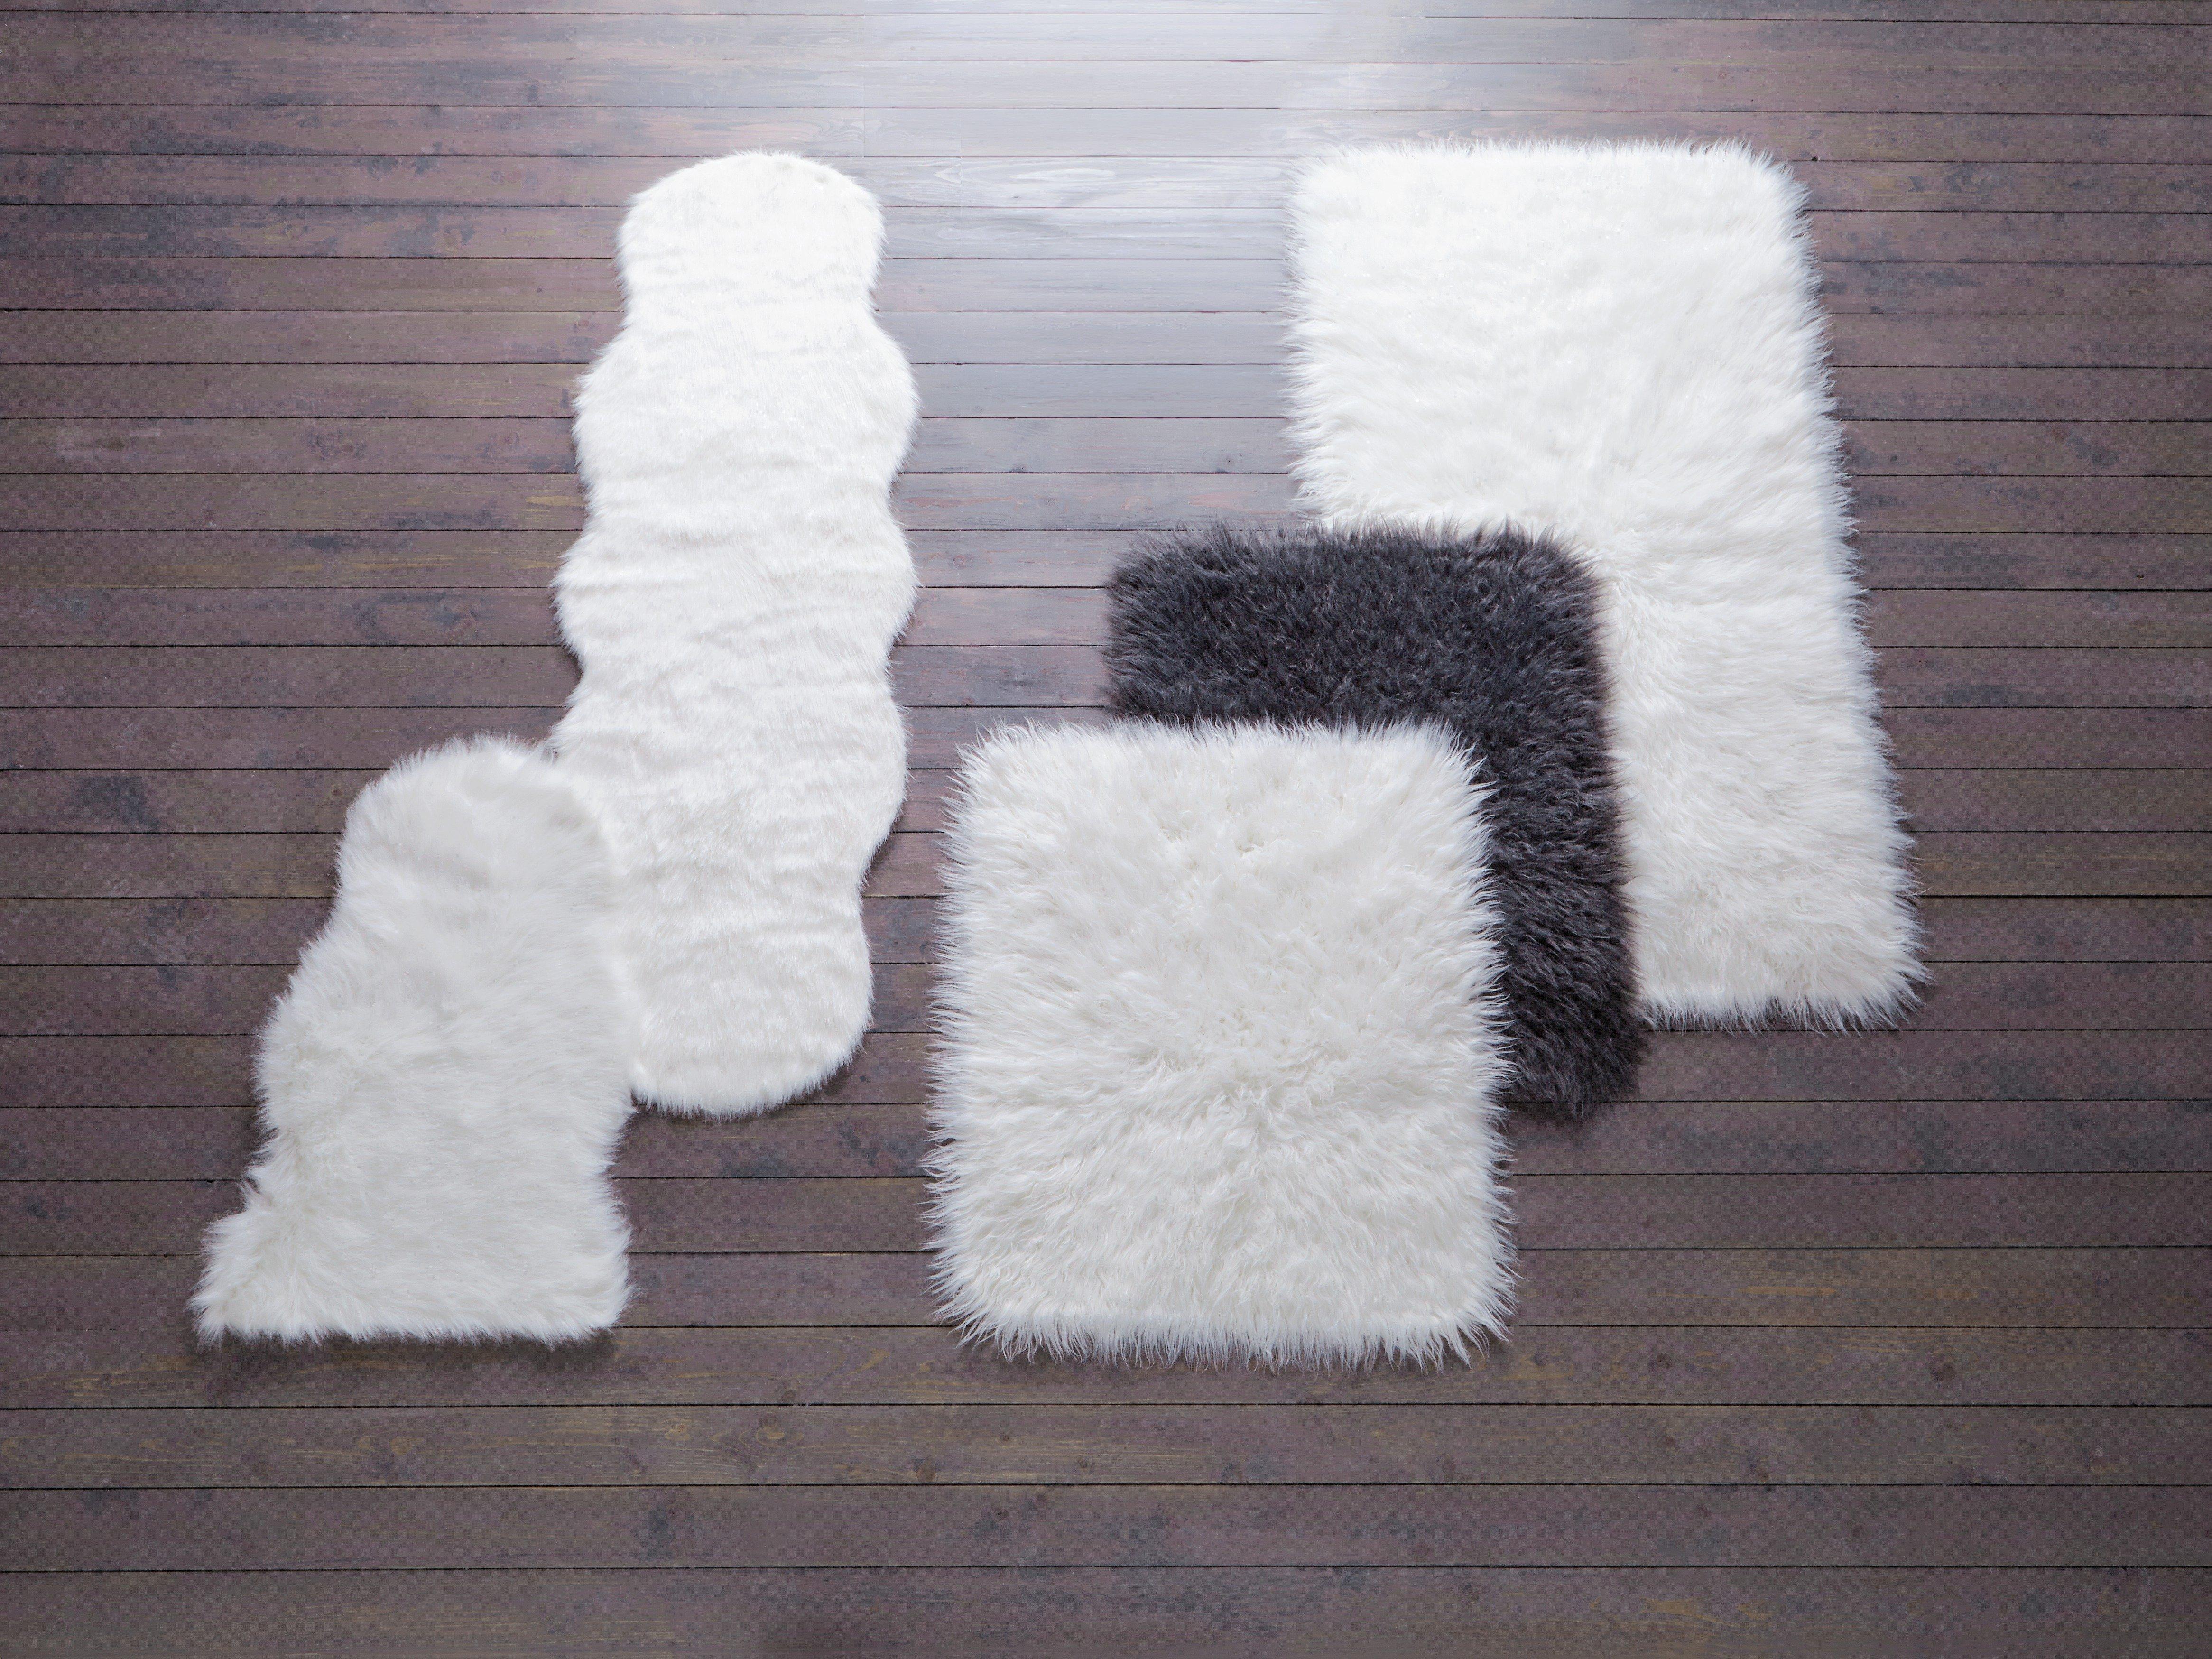 buy home faux sheepskin rug - 60x90cm - natural at argos.co.uk